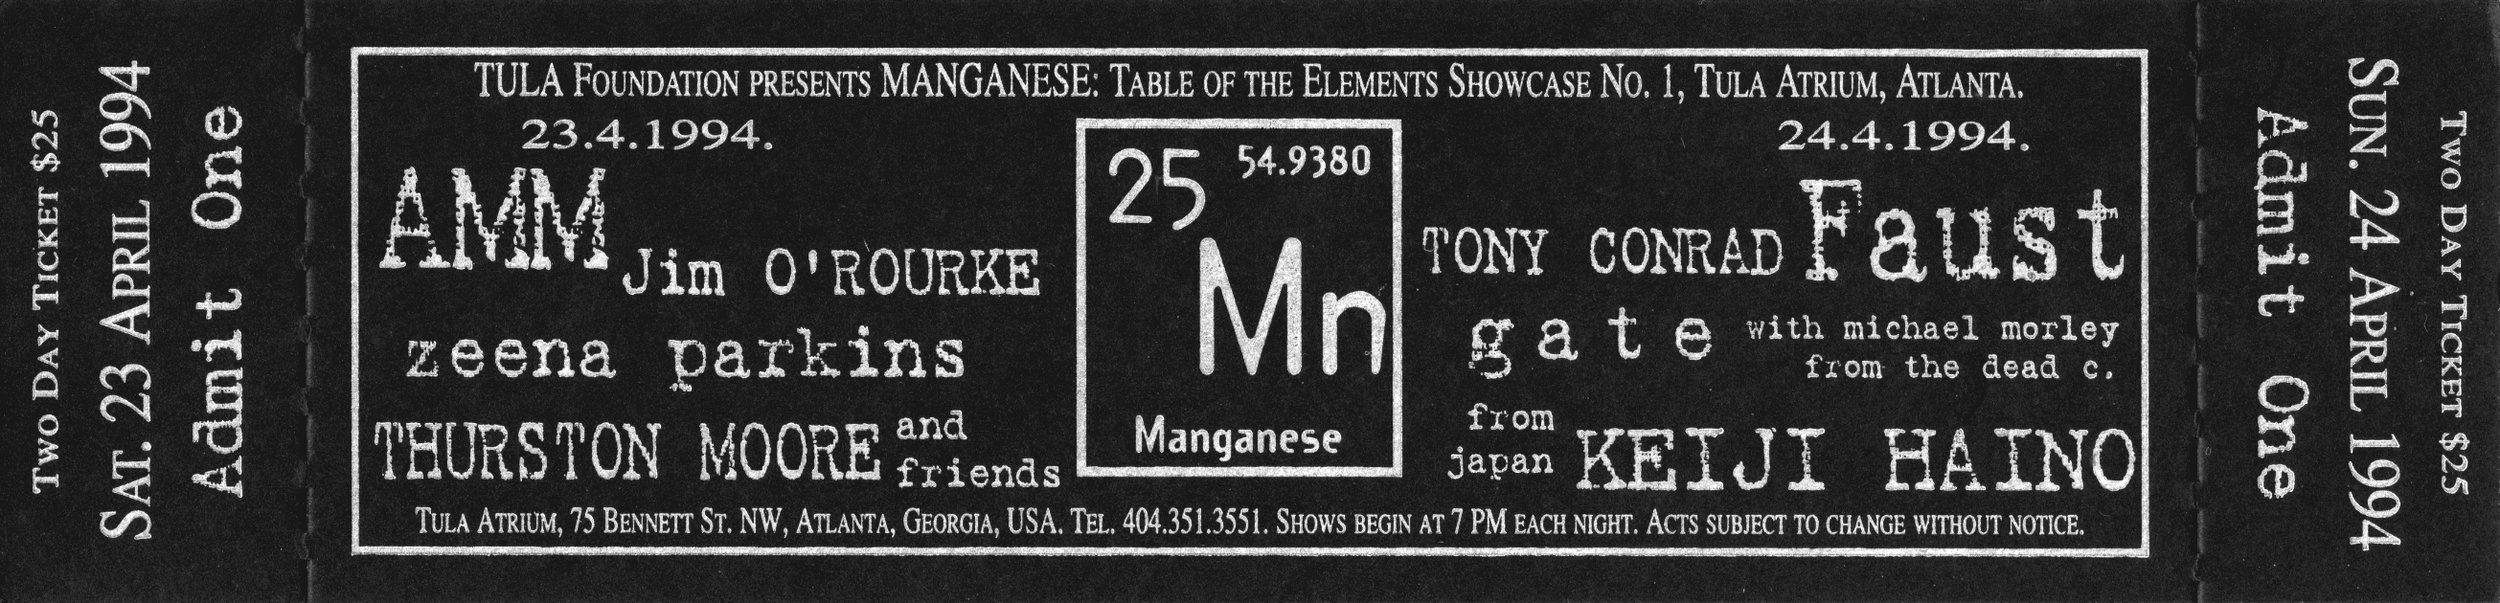 manganese admit one.jpg